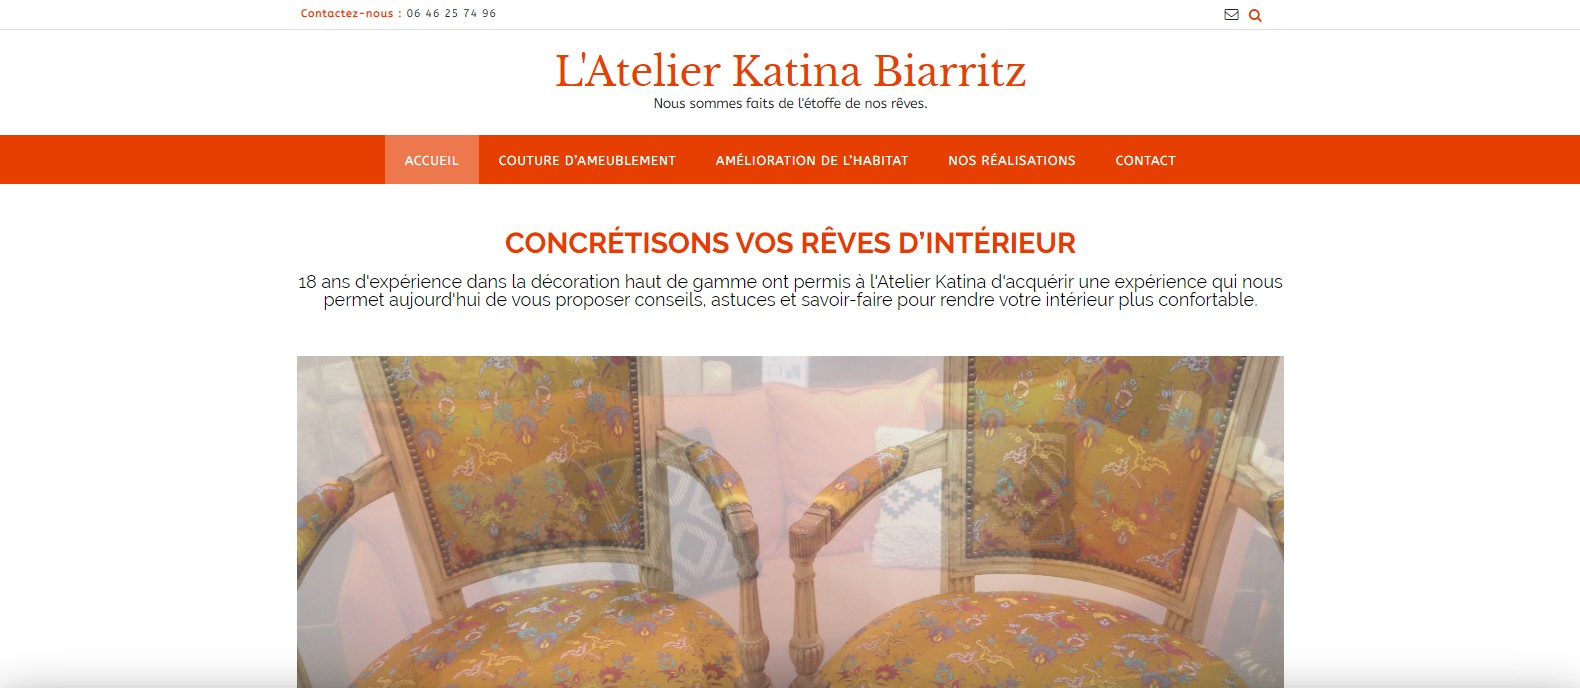 L'Atelier Katina - page d'accueil